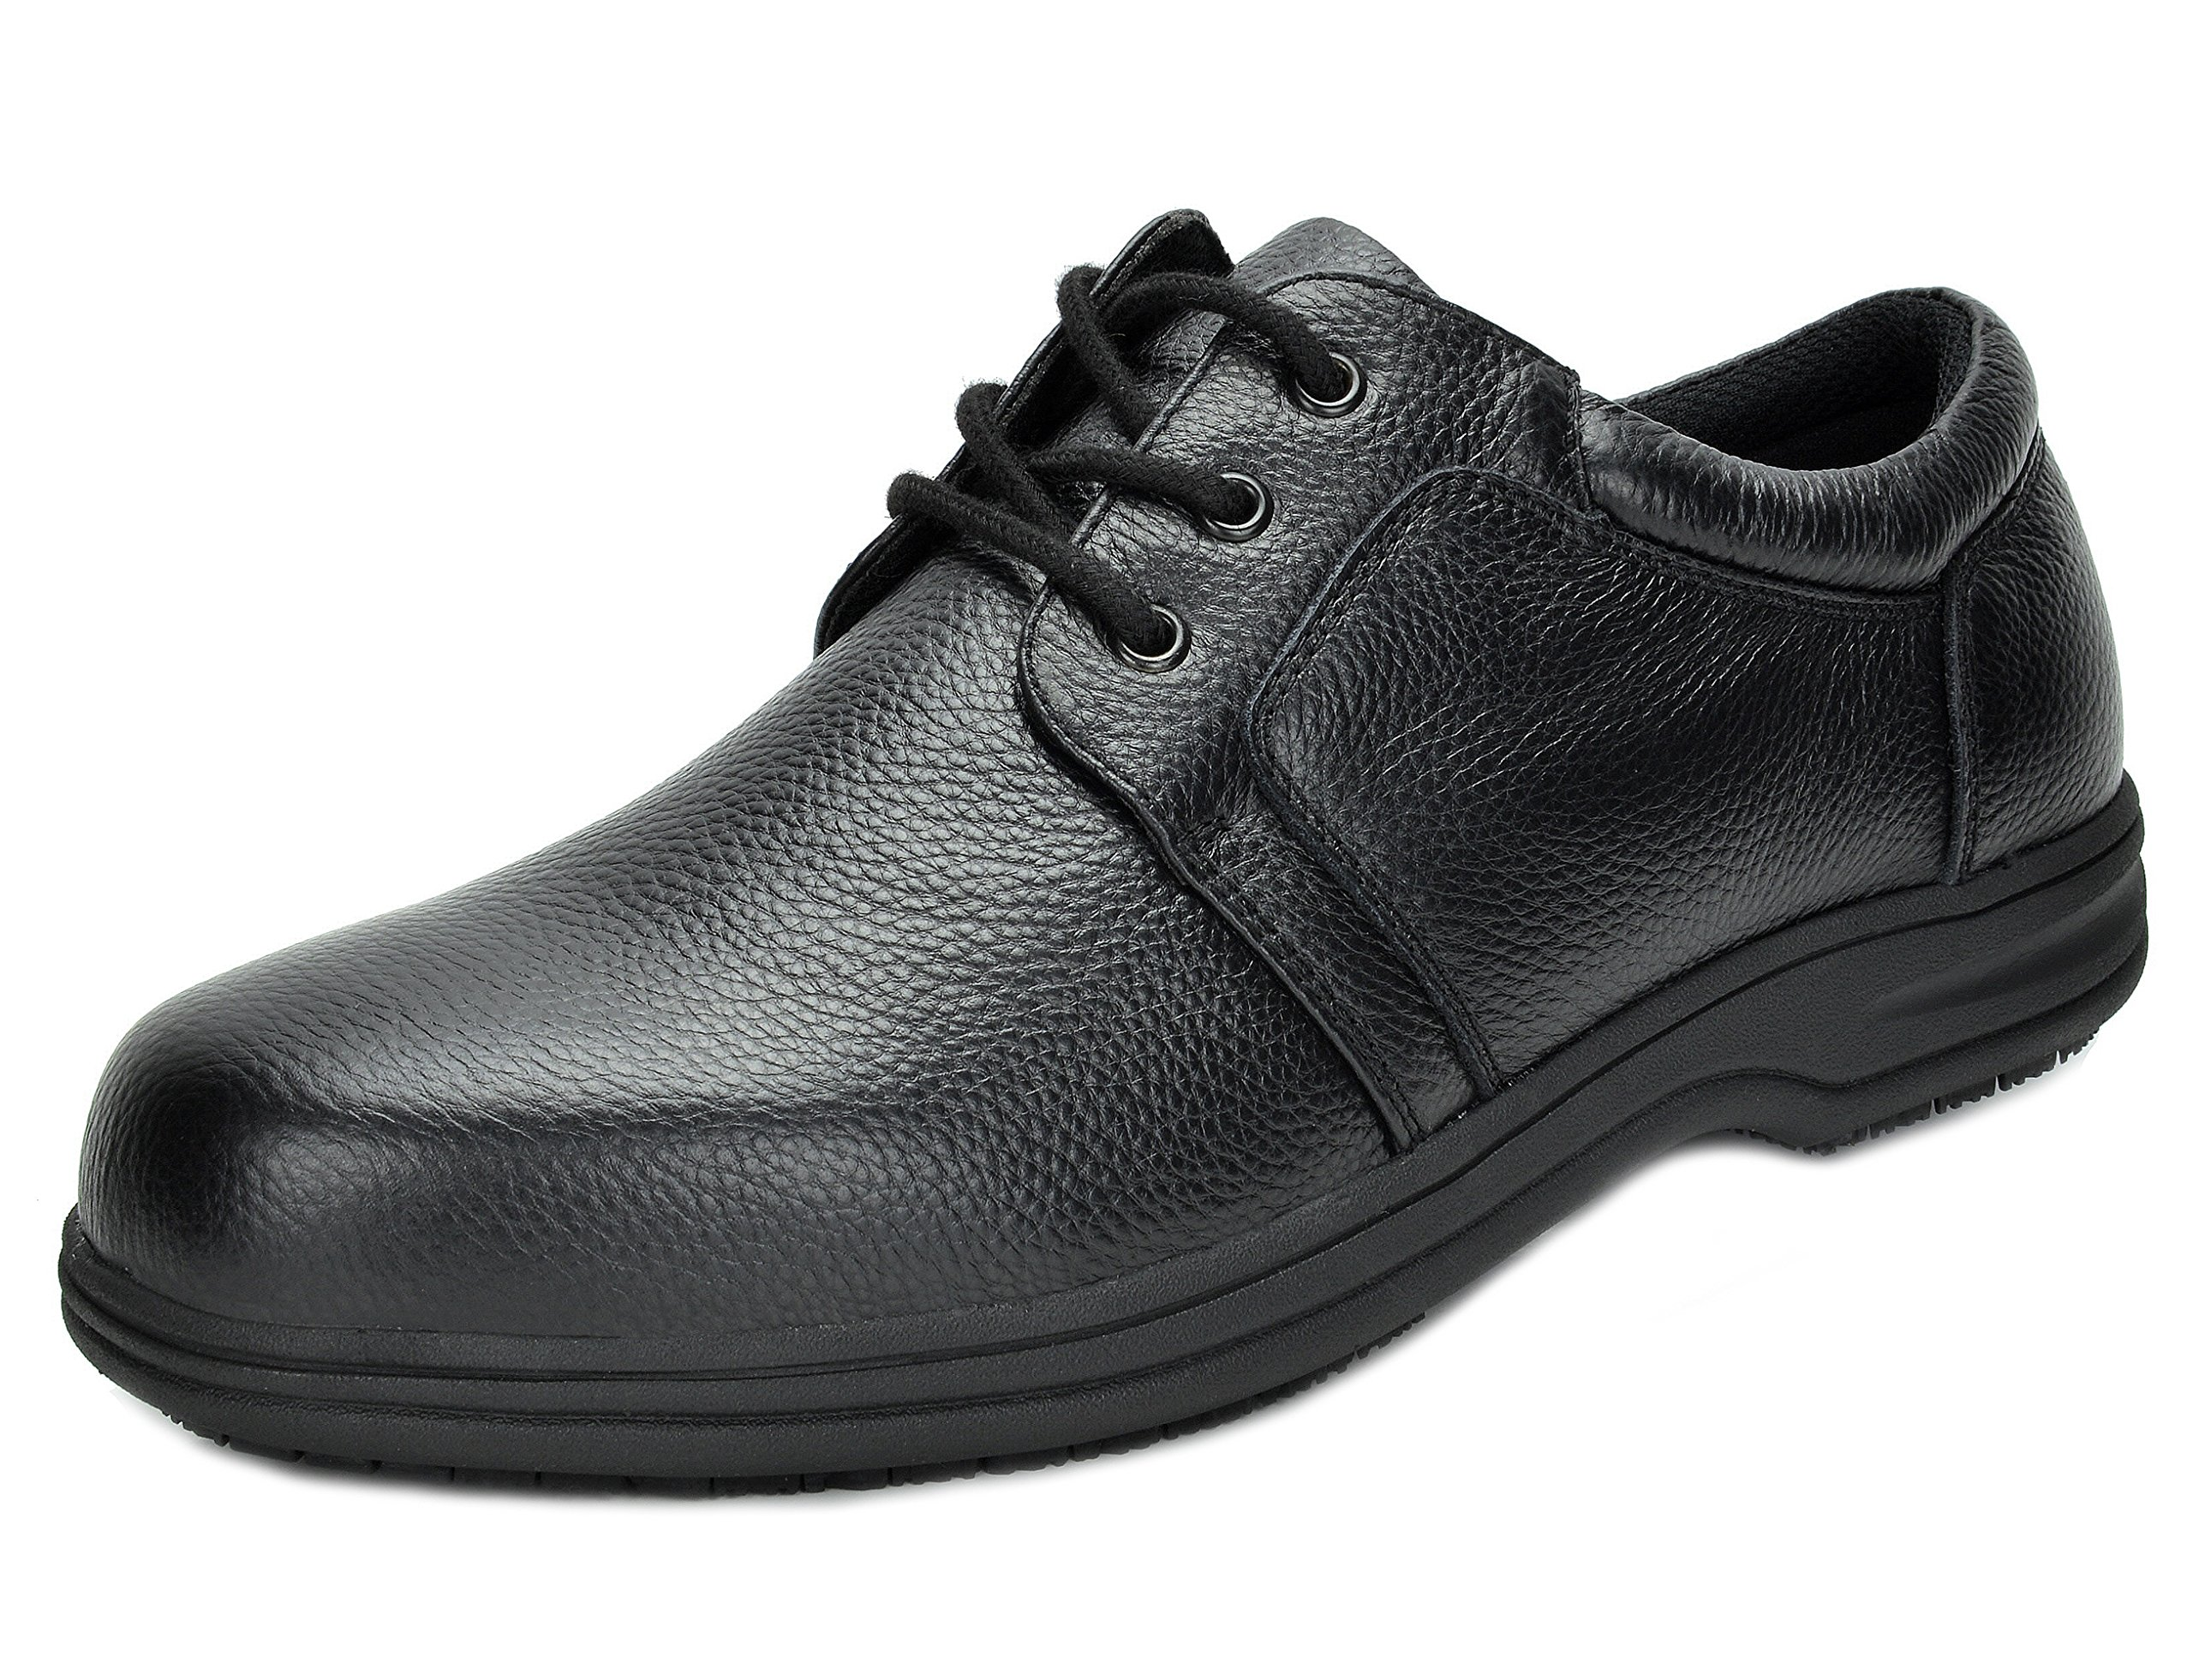 DREAM PAIRS Men's UNO-2 Black Genuine Leather Restaurant Oxfords Work Shoes - 13 M US